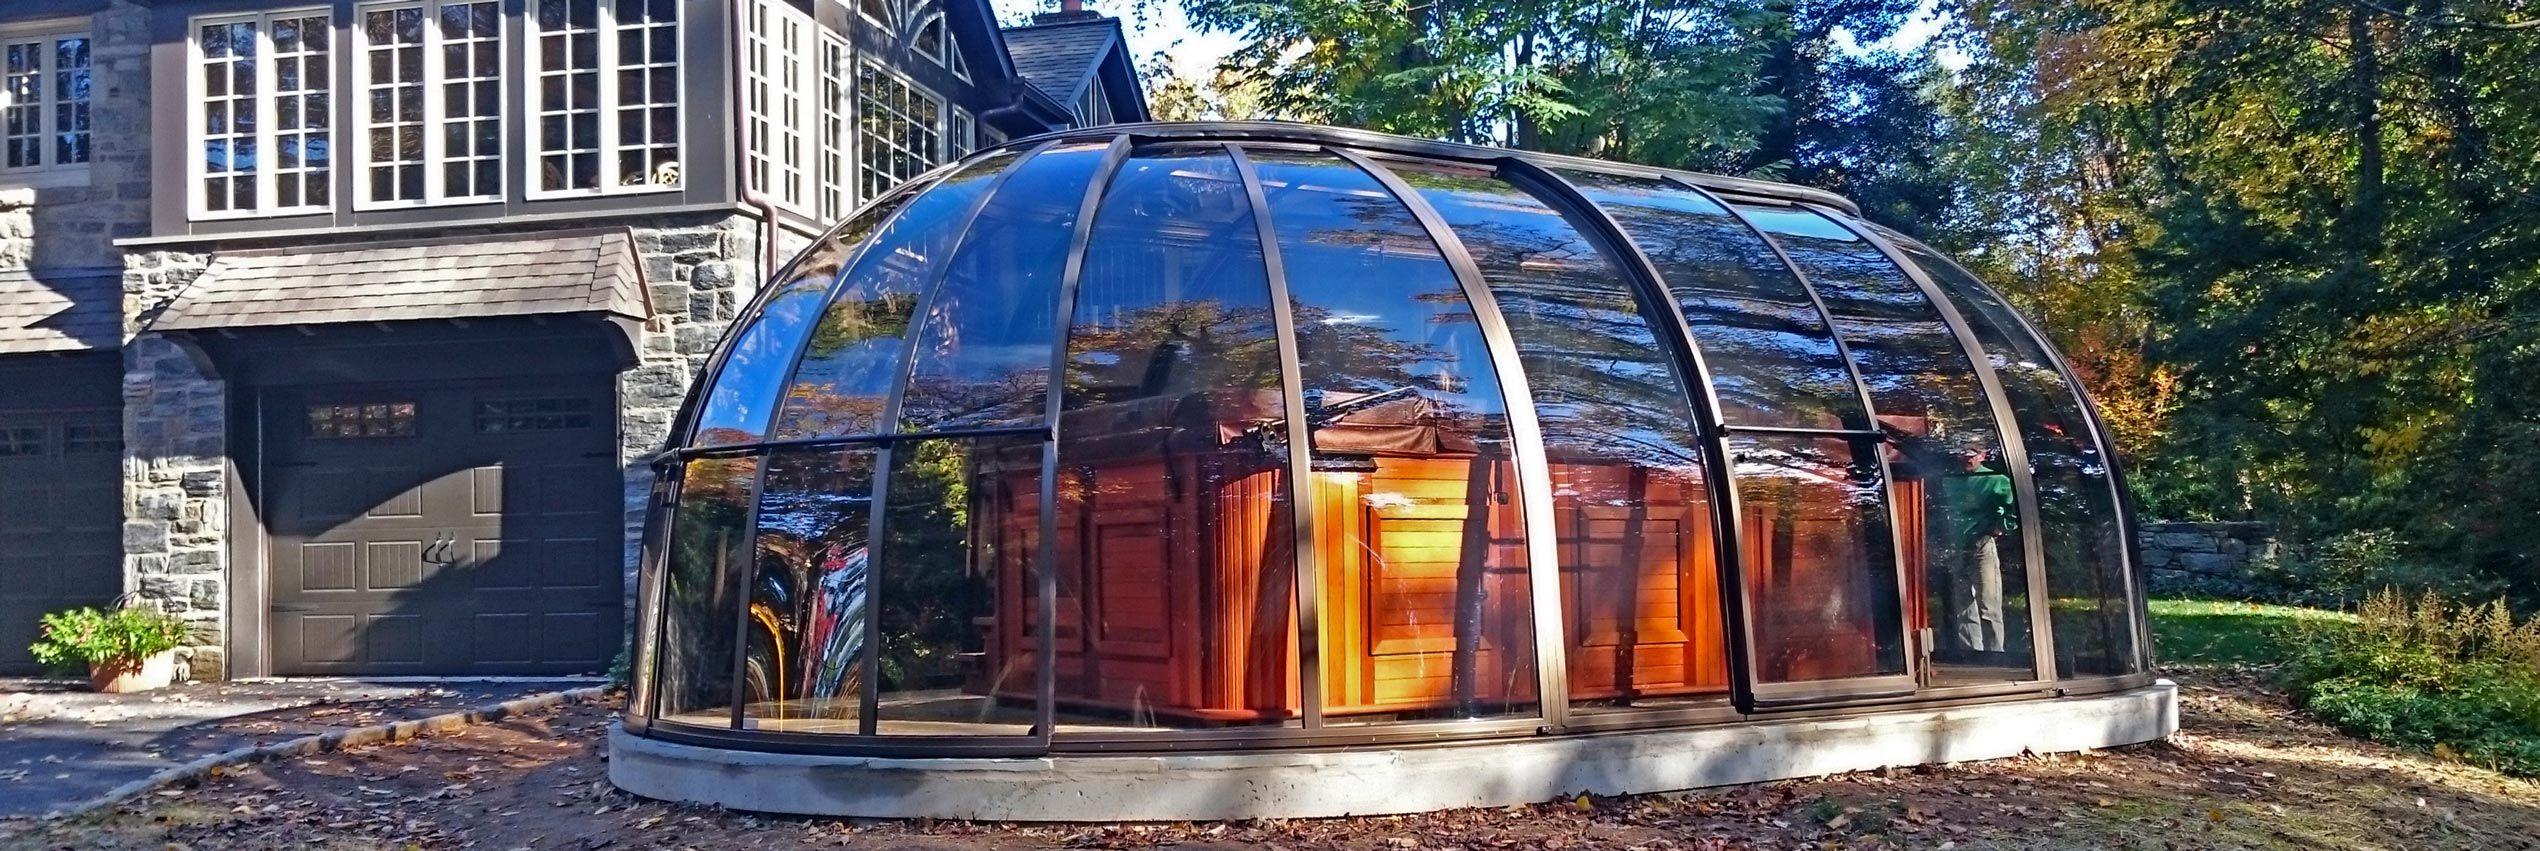 Acoperire Spa Sunhouse Inchisa